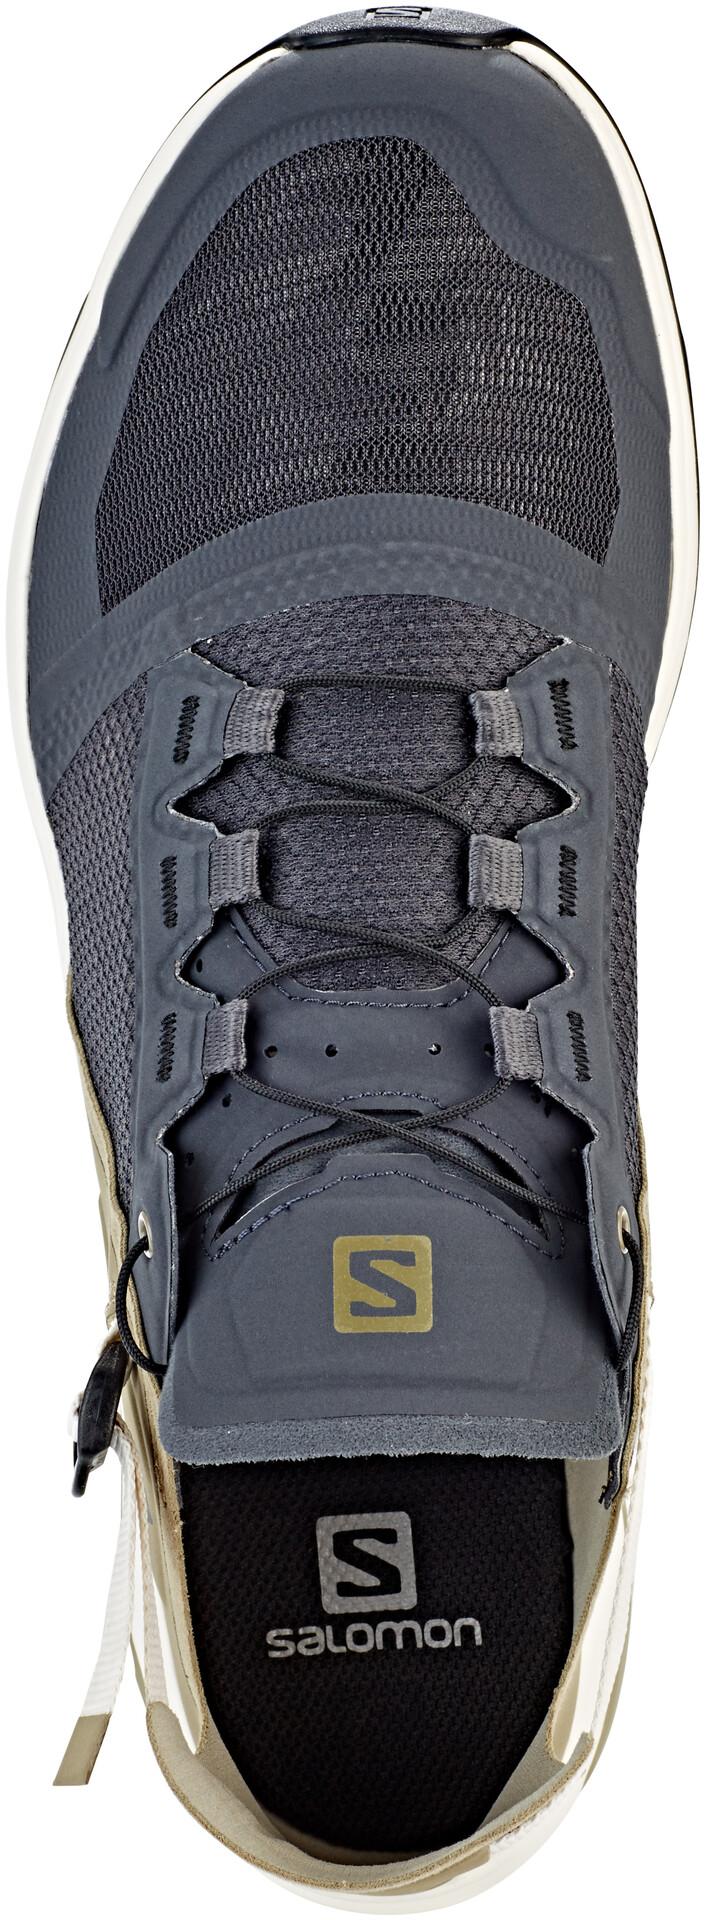 Salomon Techamphibian 4 Chaussures Homme, ebonymermaidvanilla ice